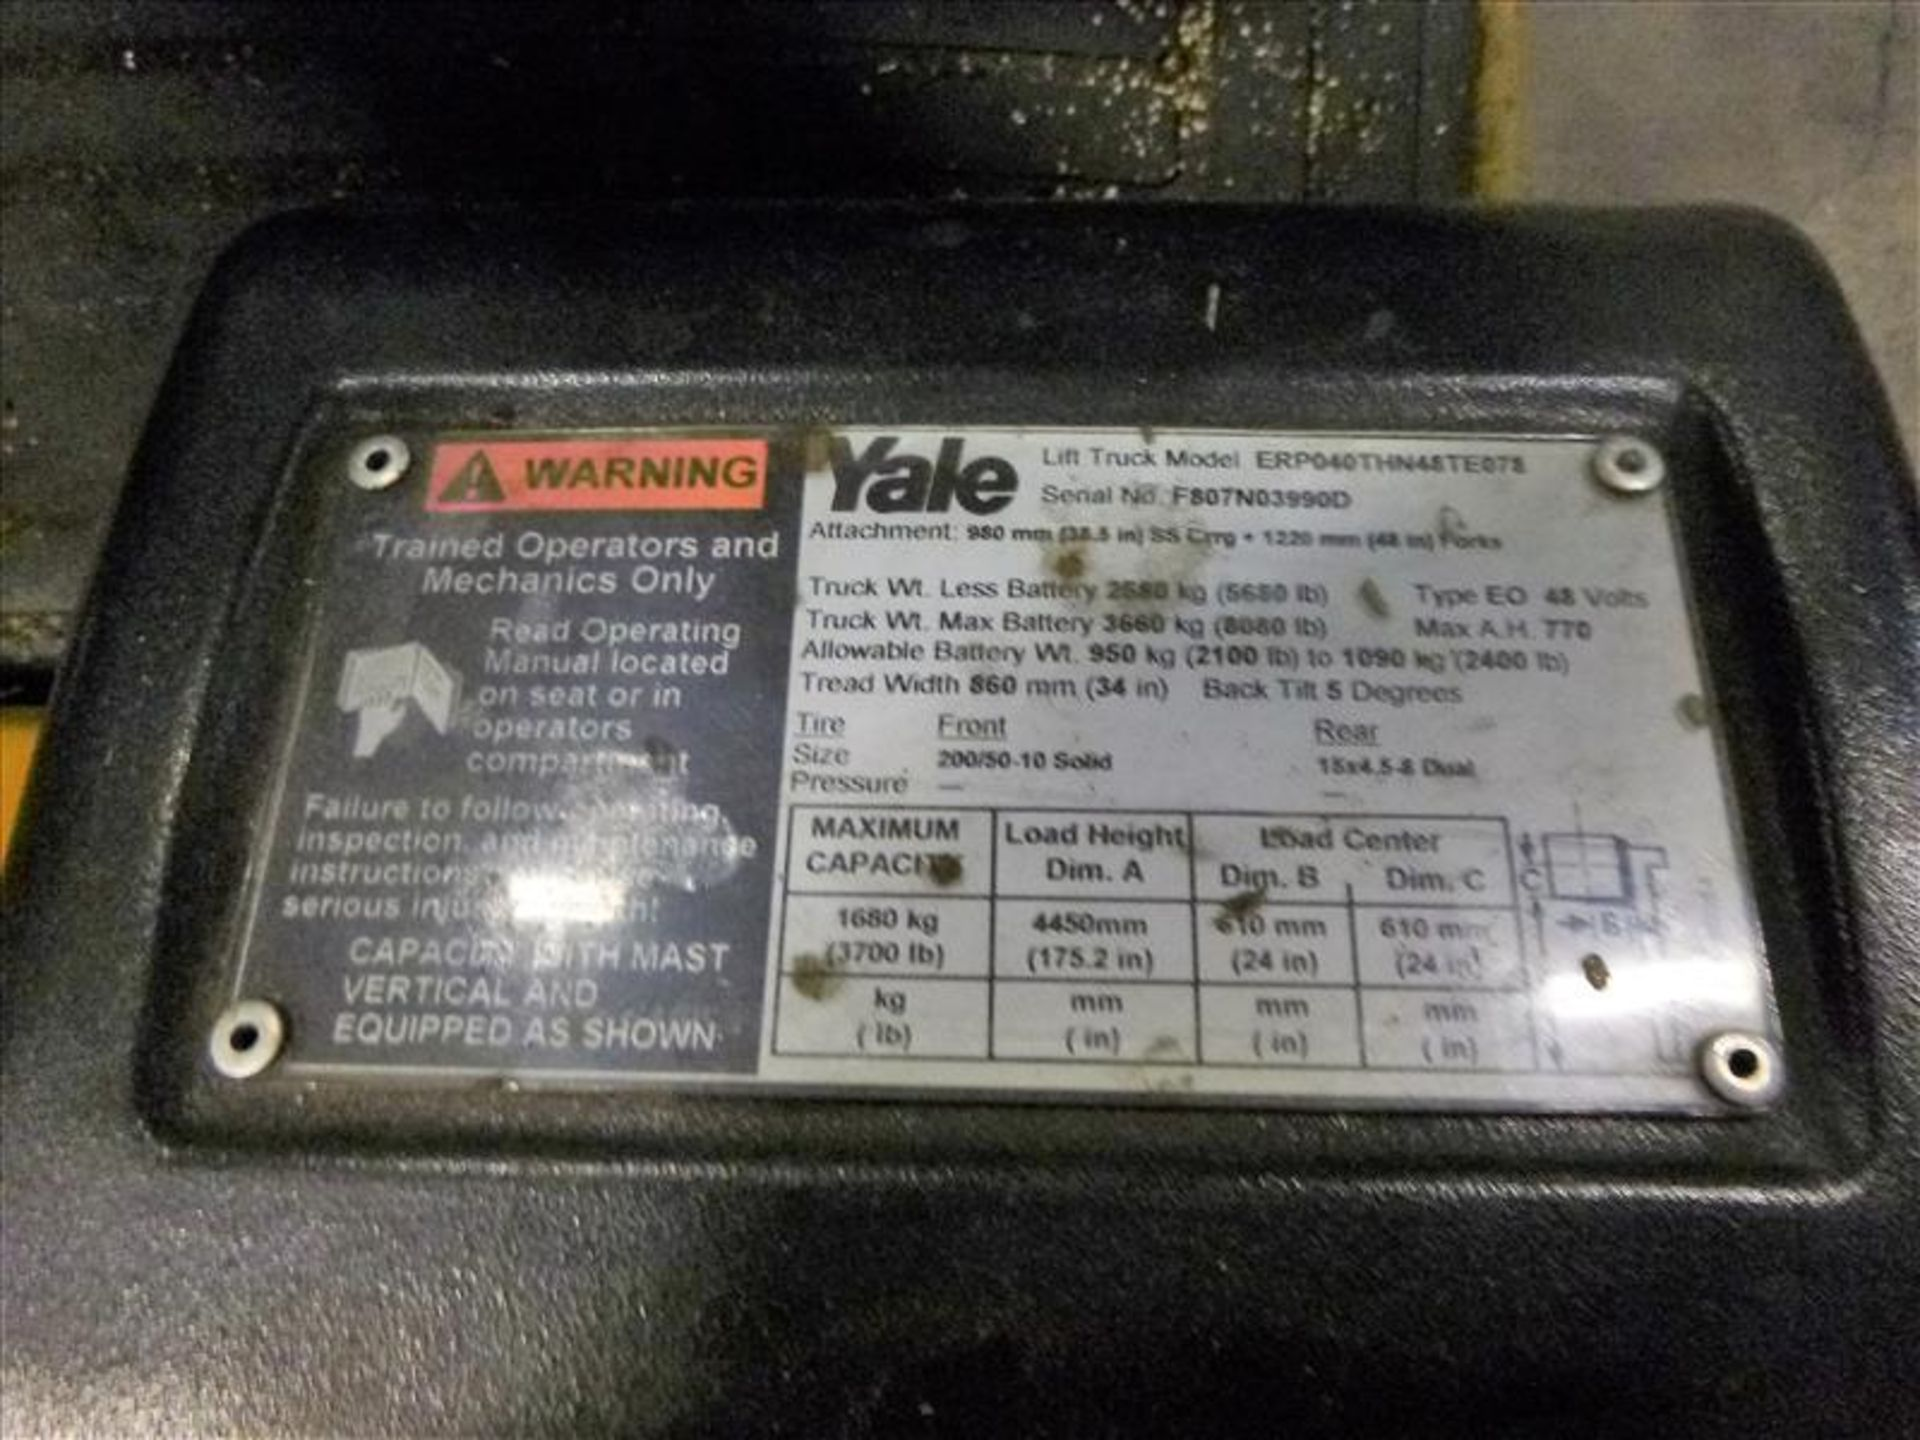 Yale fork lift truck, mod. ERP040VTHN48TE078, ser. no. F807N03990D, 48V electric, 3700 lbs cap., 175 - Image 4 of 4